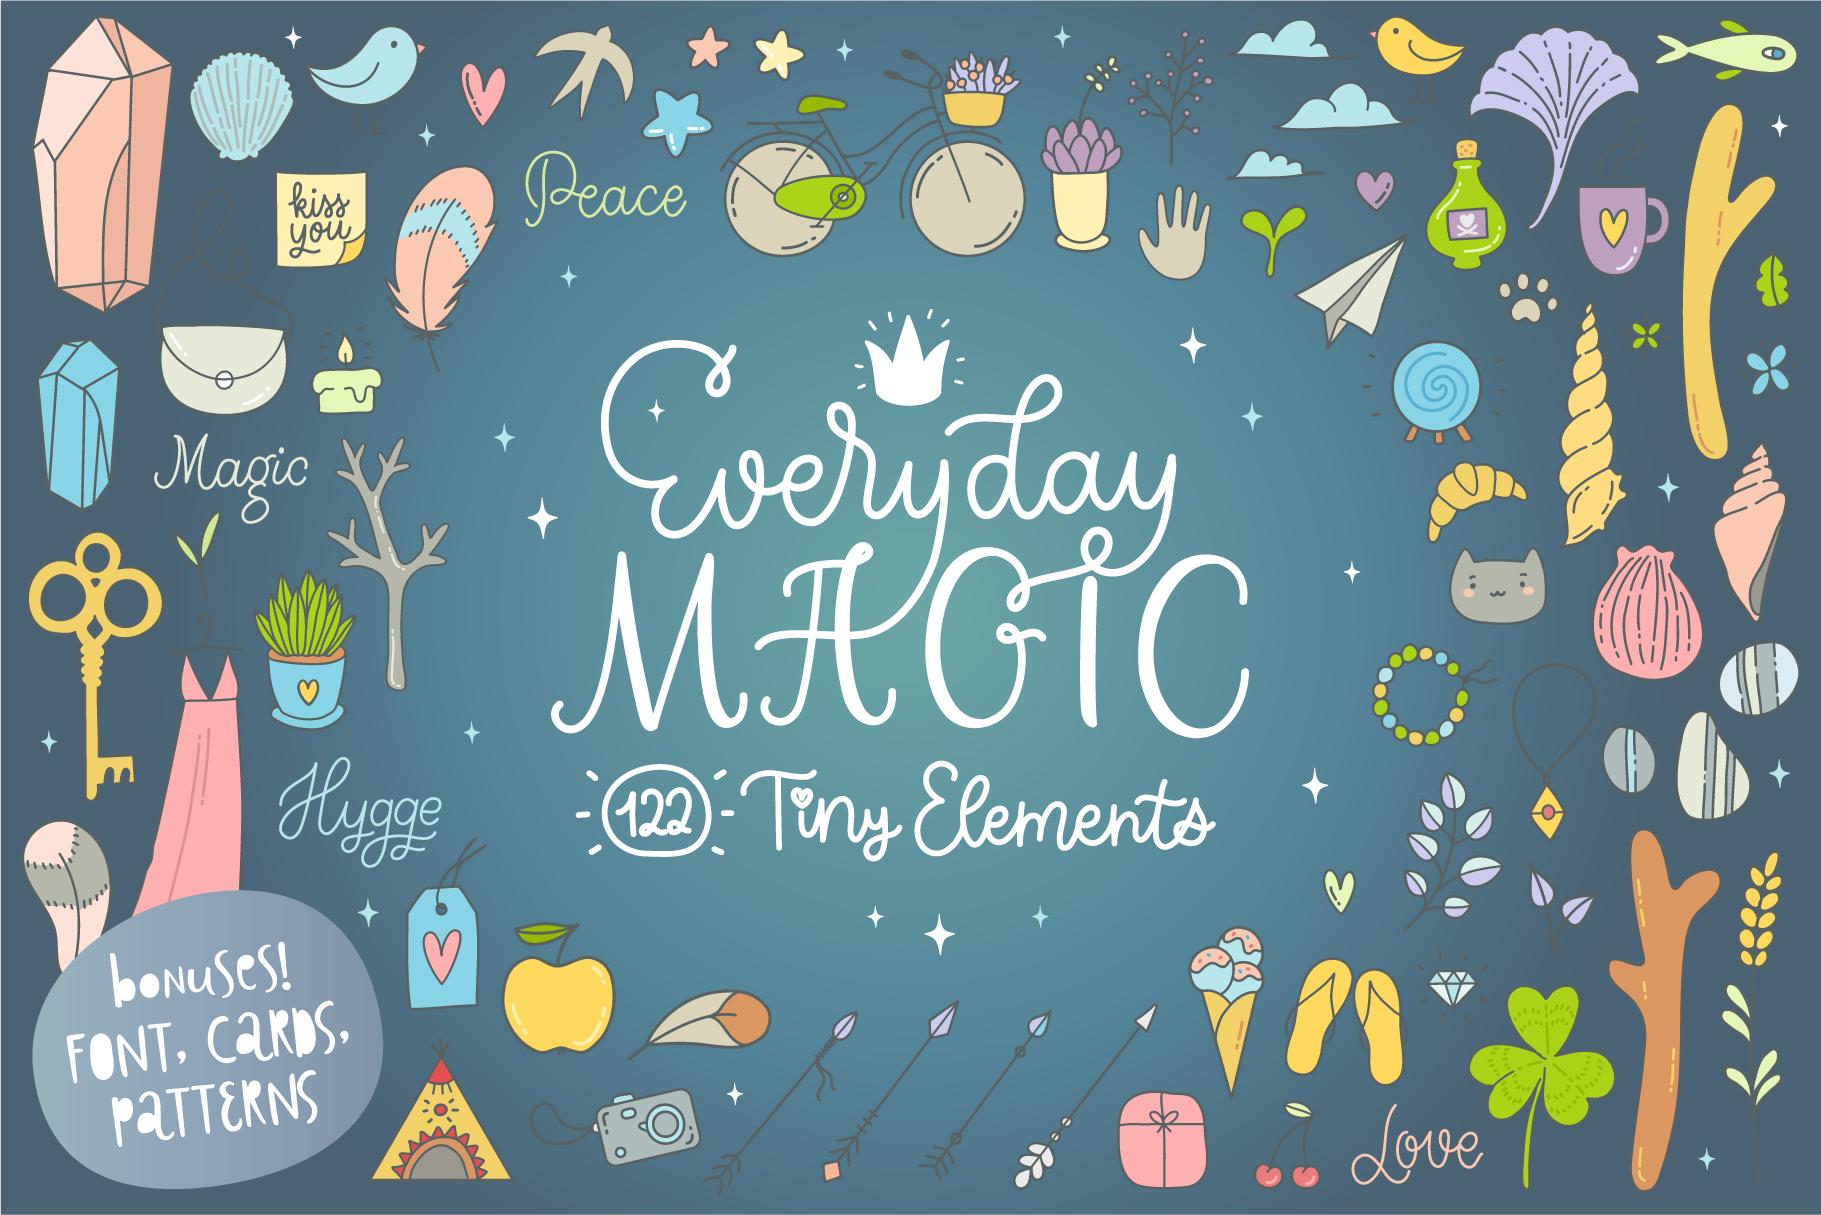 Everyday Magic Vectors and BONUSES example image 1